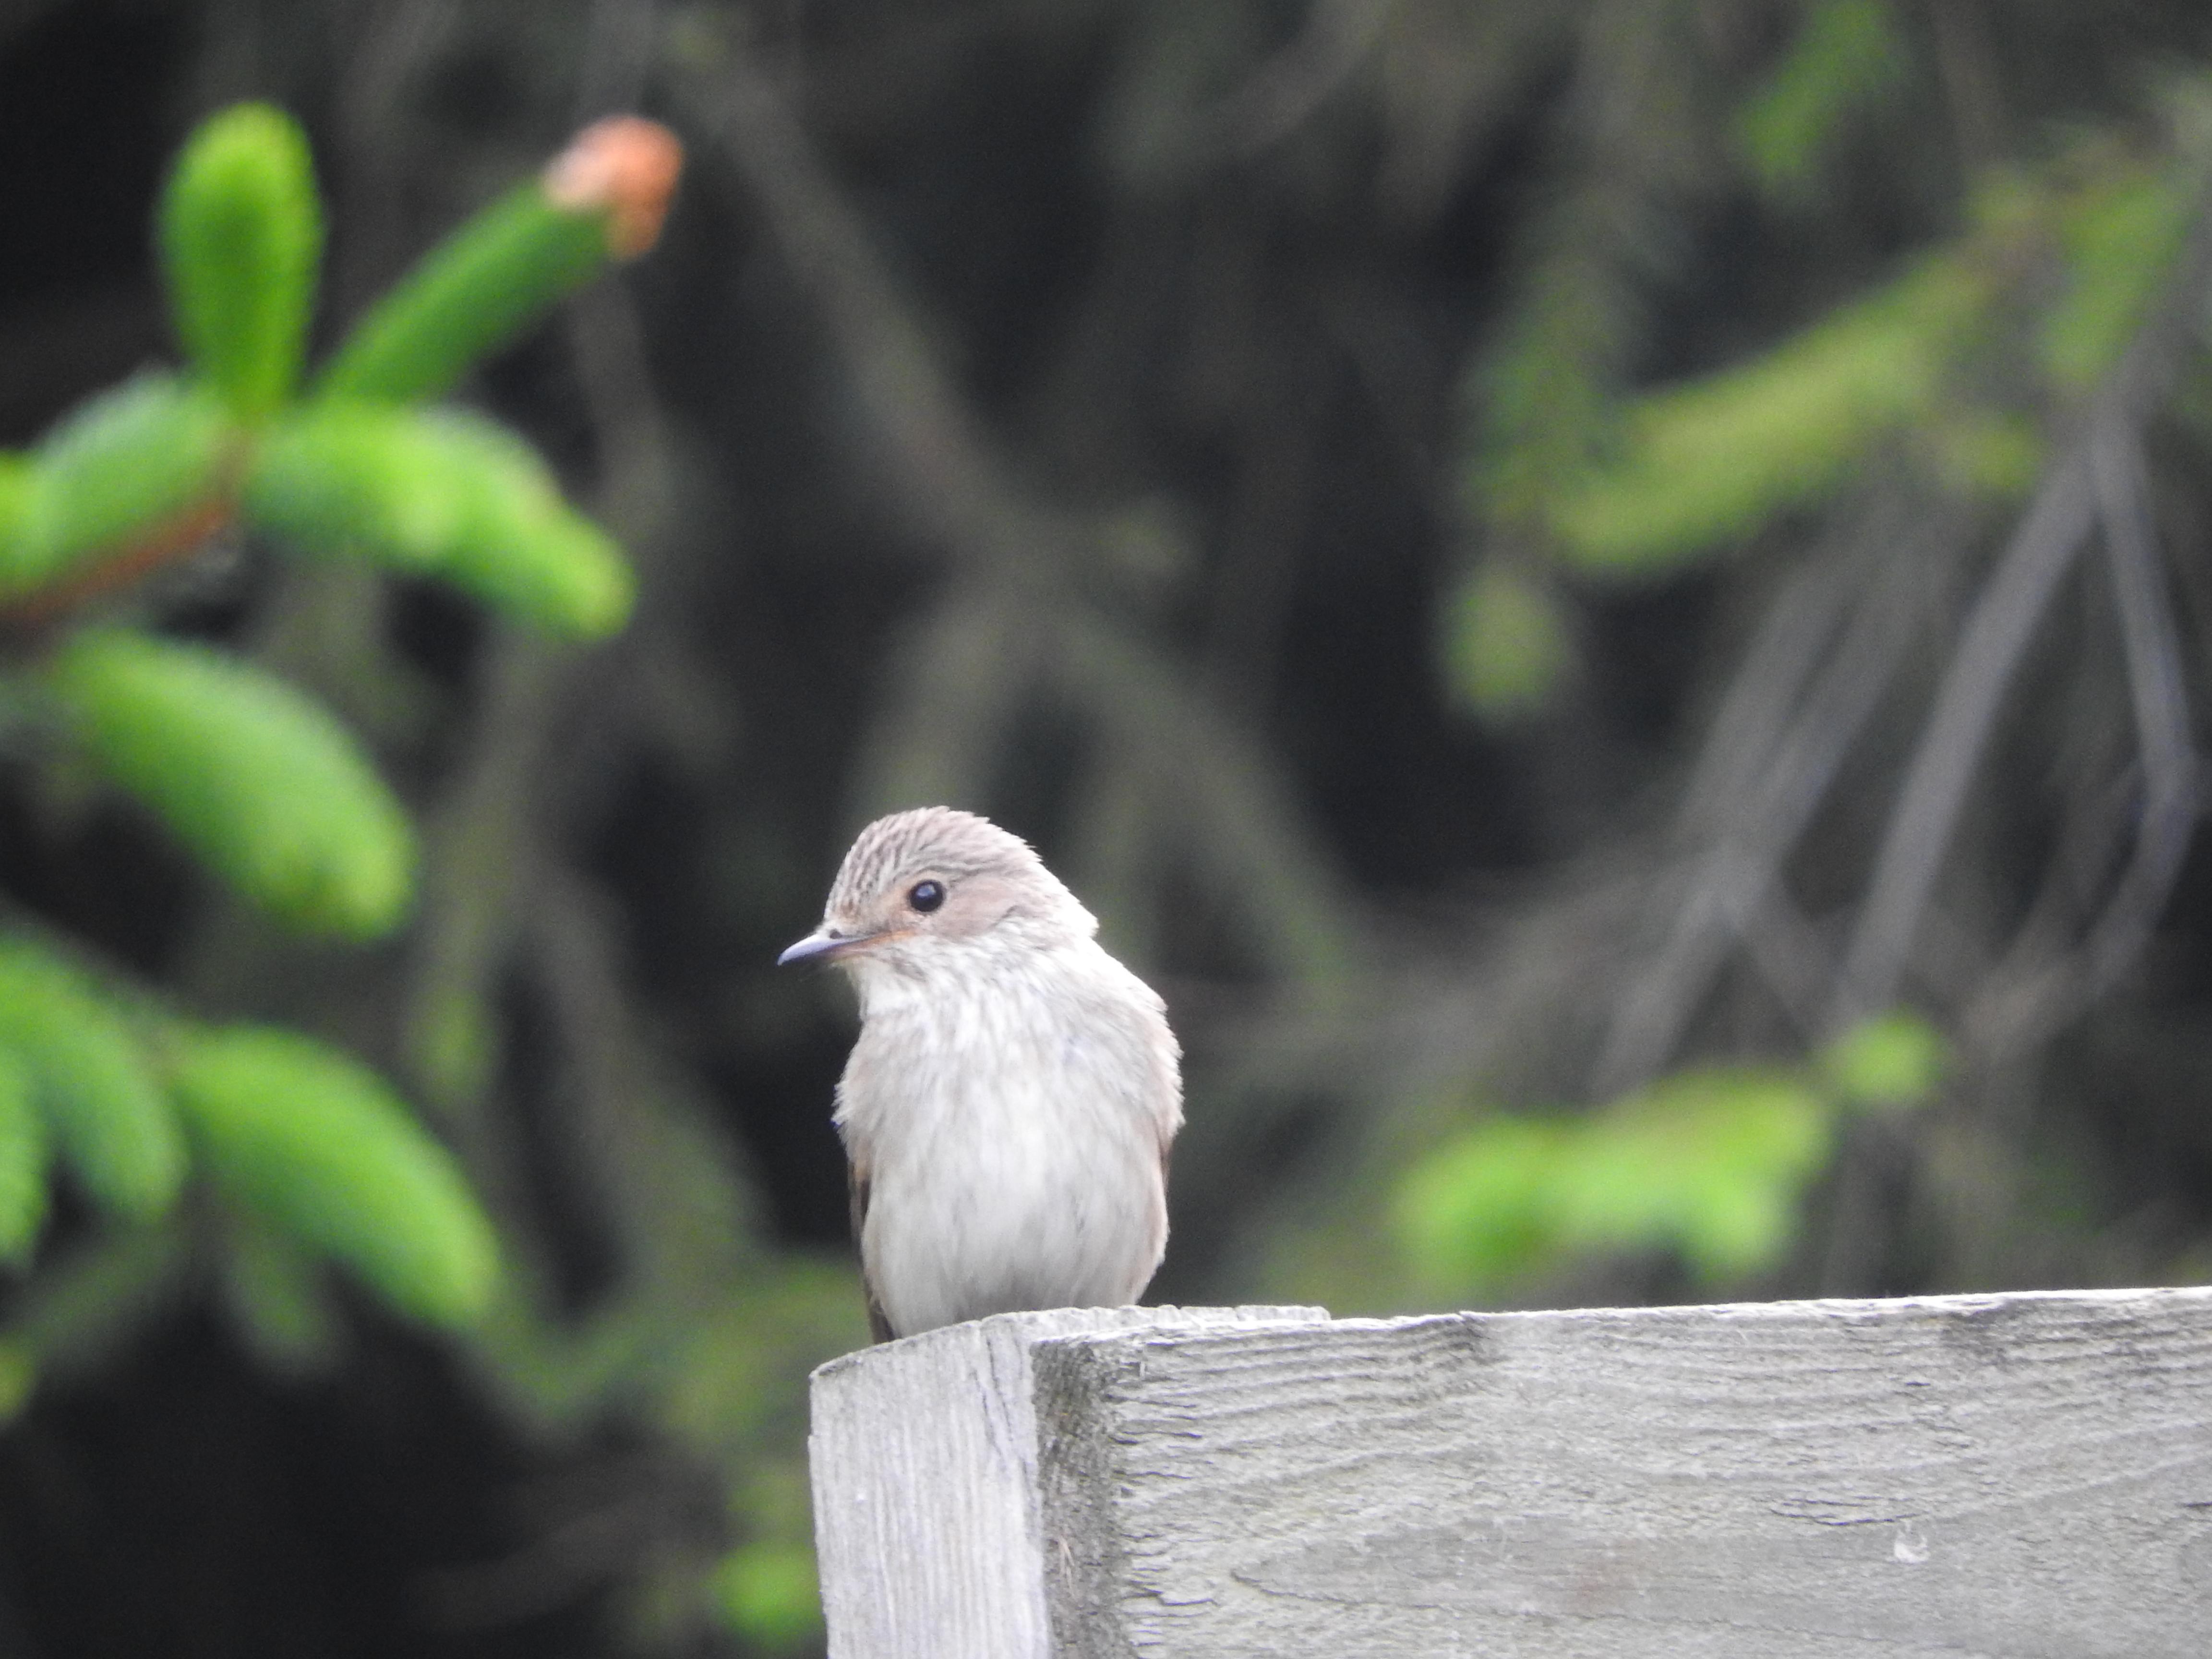 Wild little bird